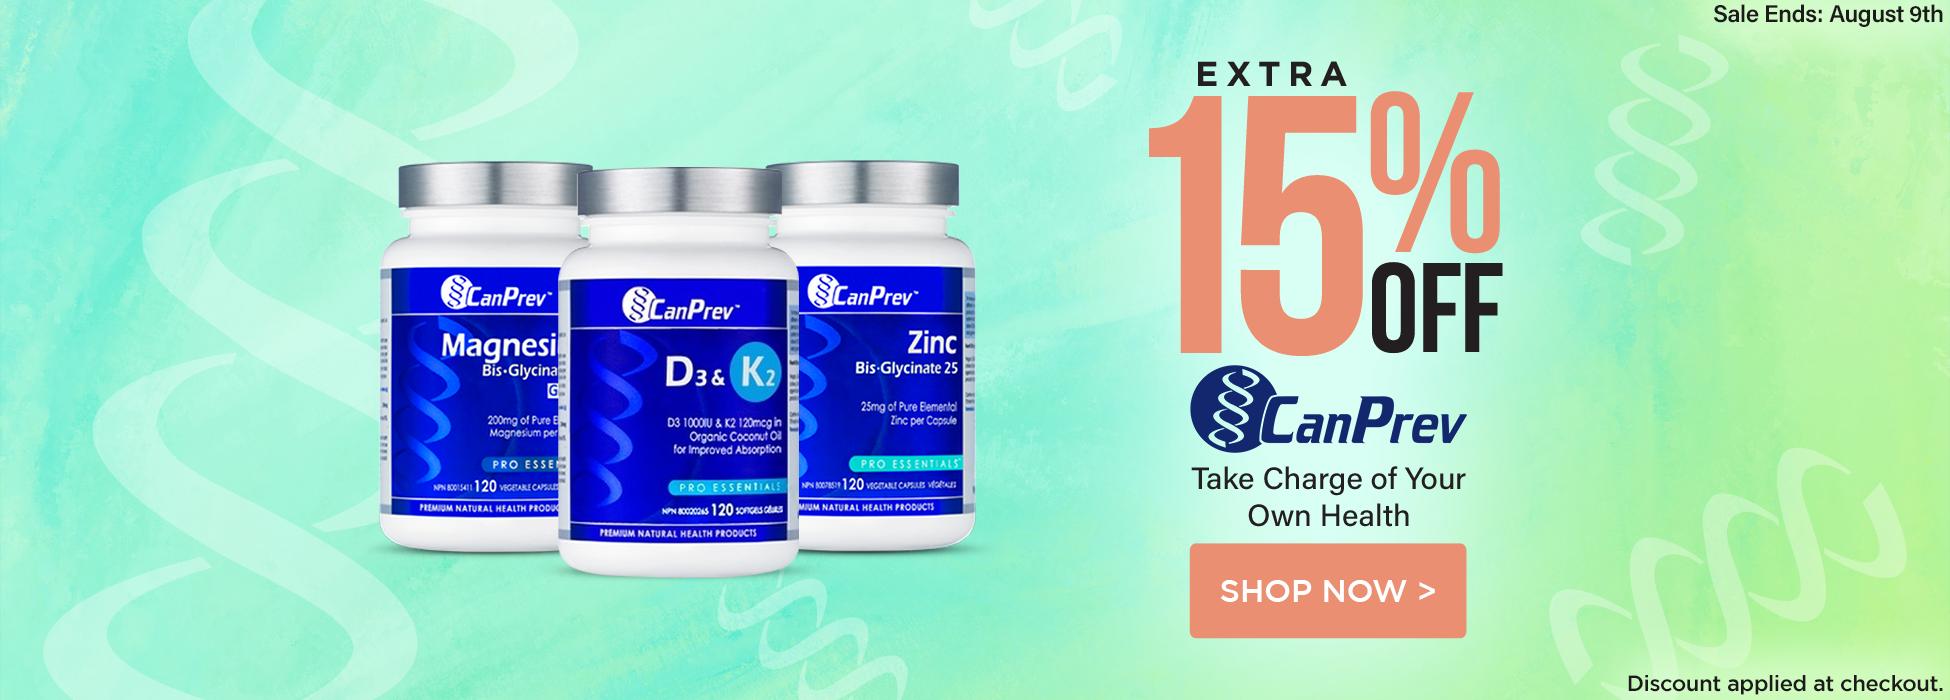 CanPrev sale magnesium vitamin d3 & K1 Zinc